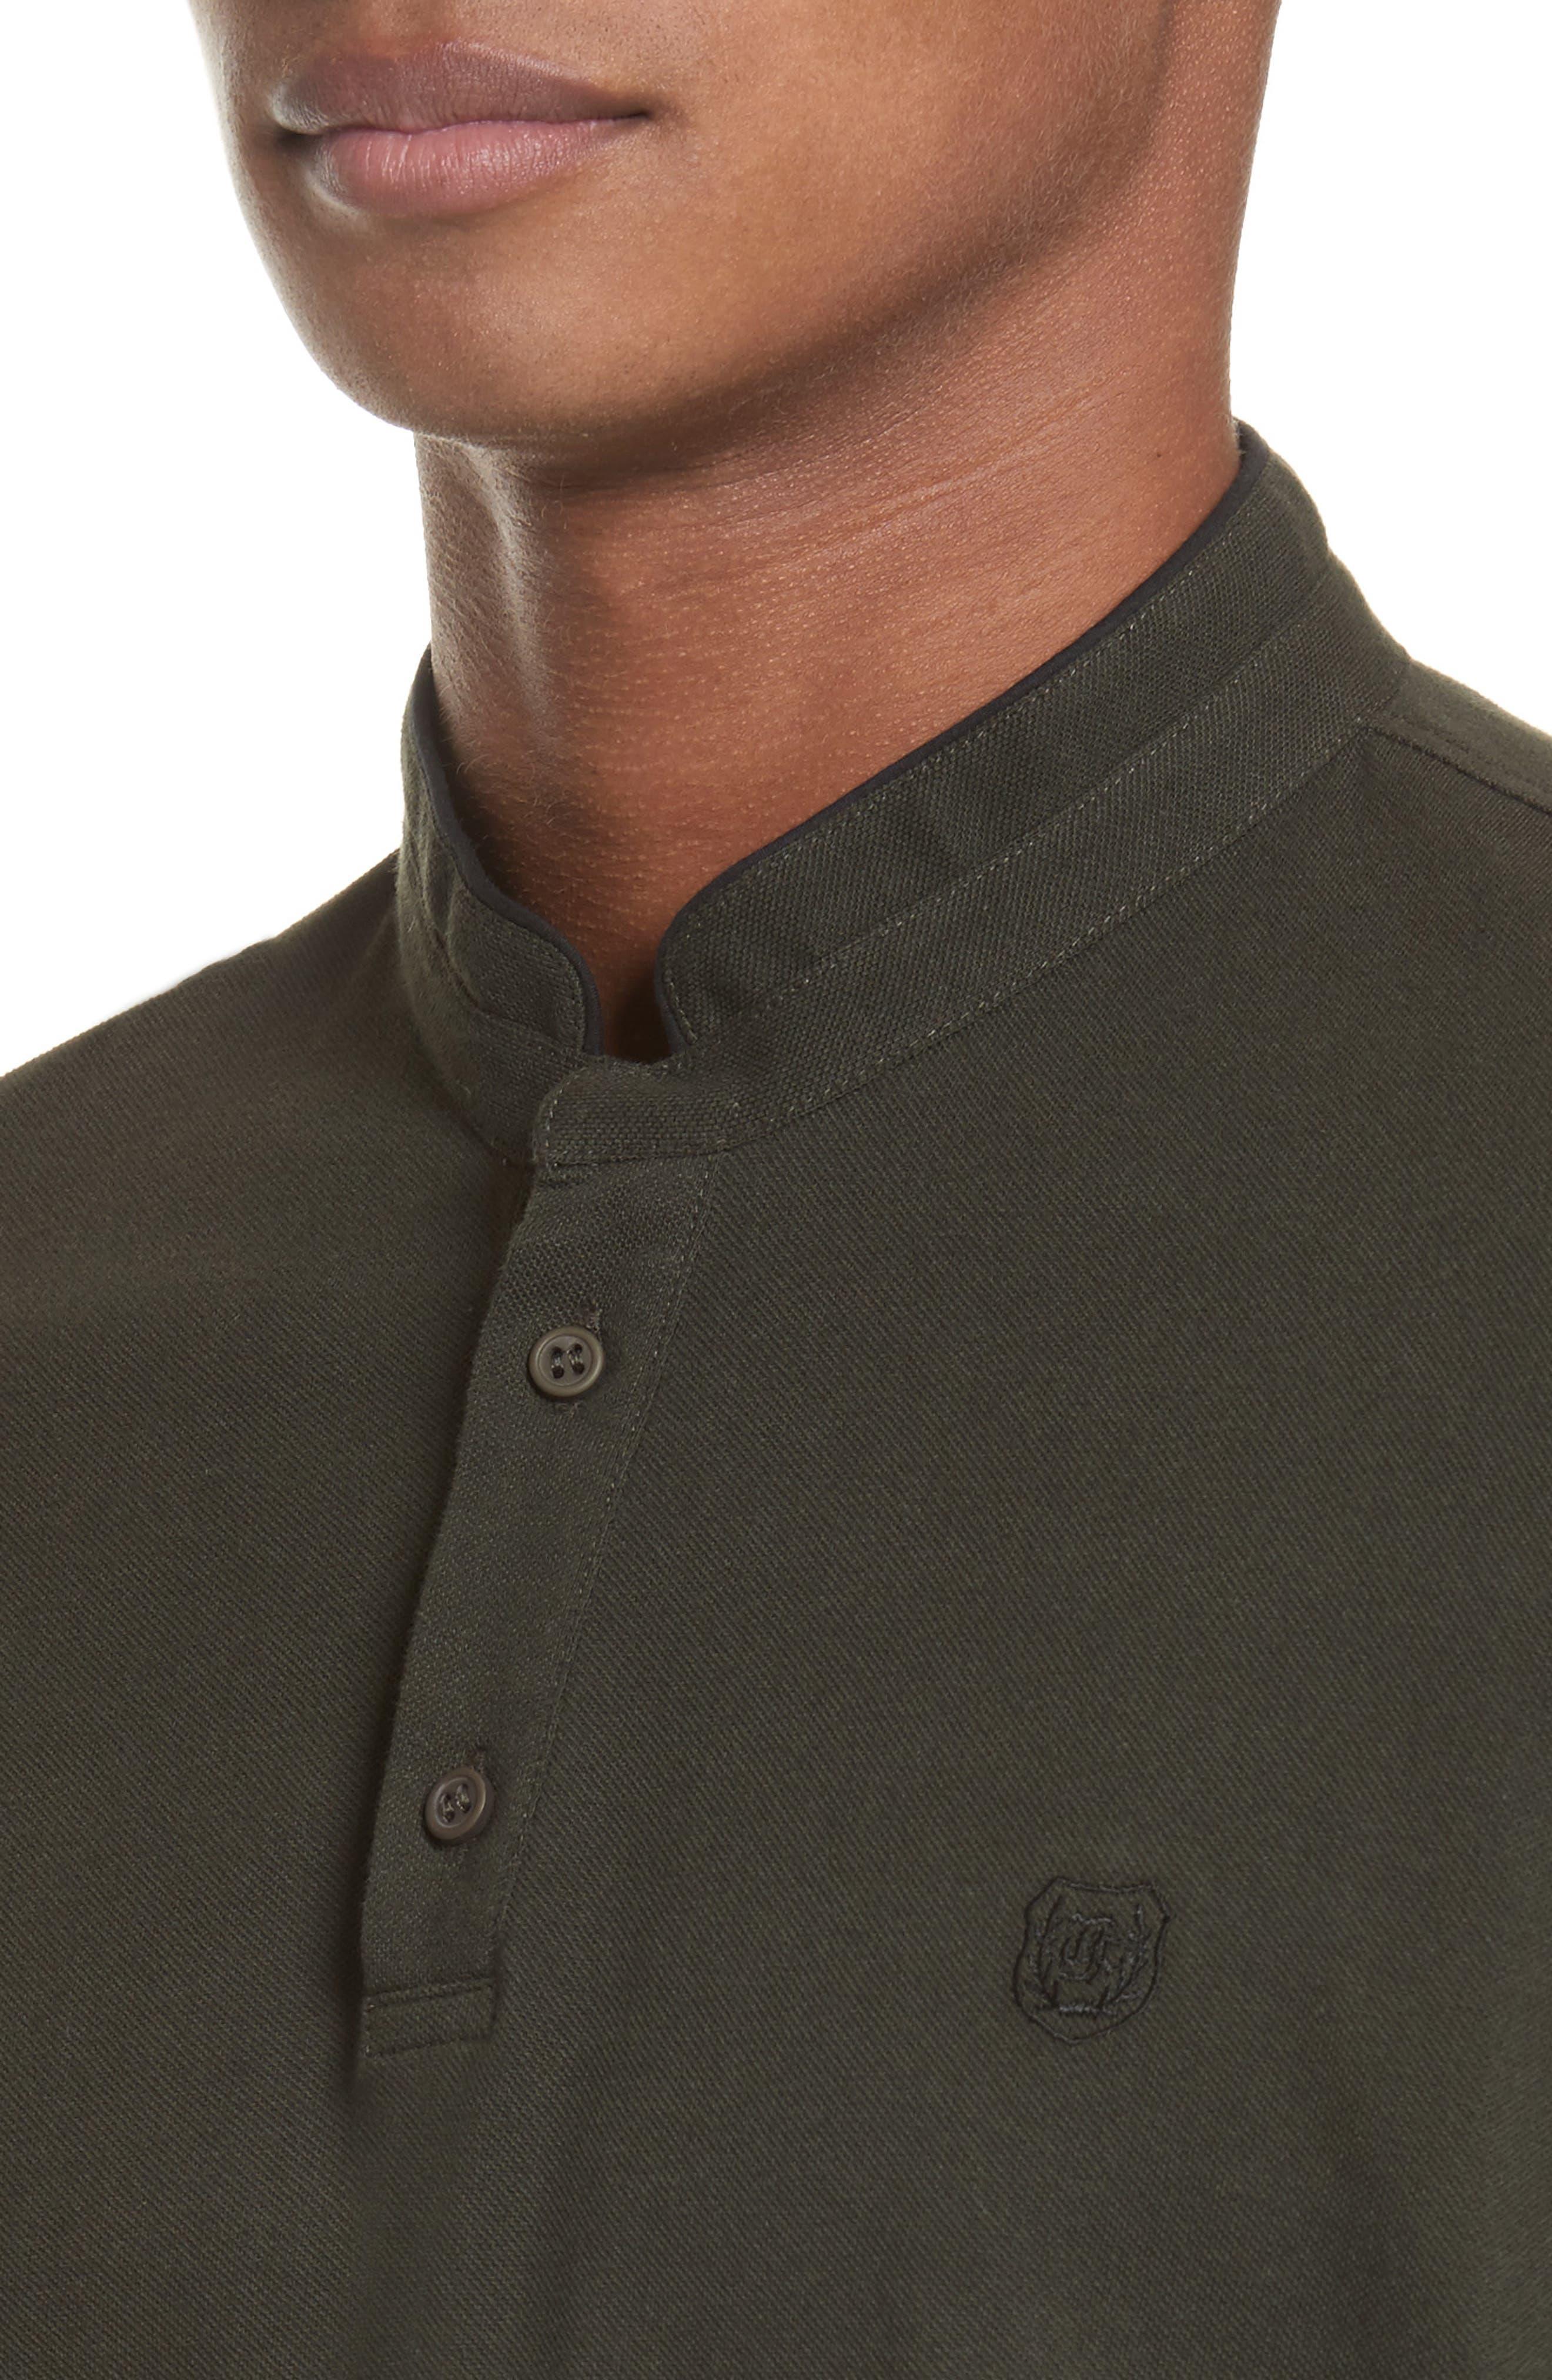 Officer Polo Shirt,                             Alternate thumbnail 4, color,                             311